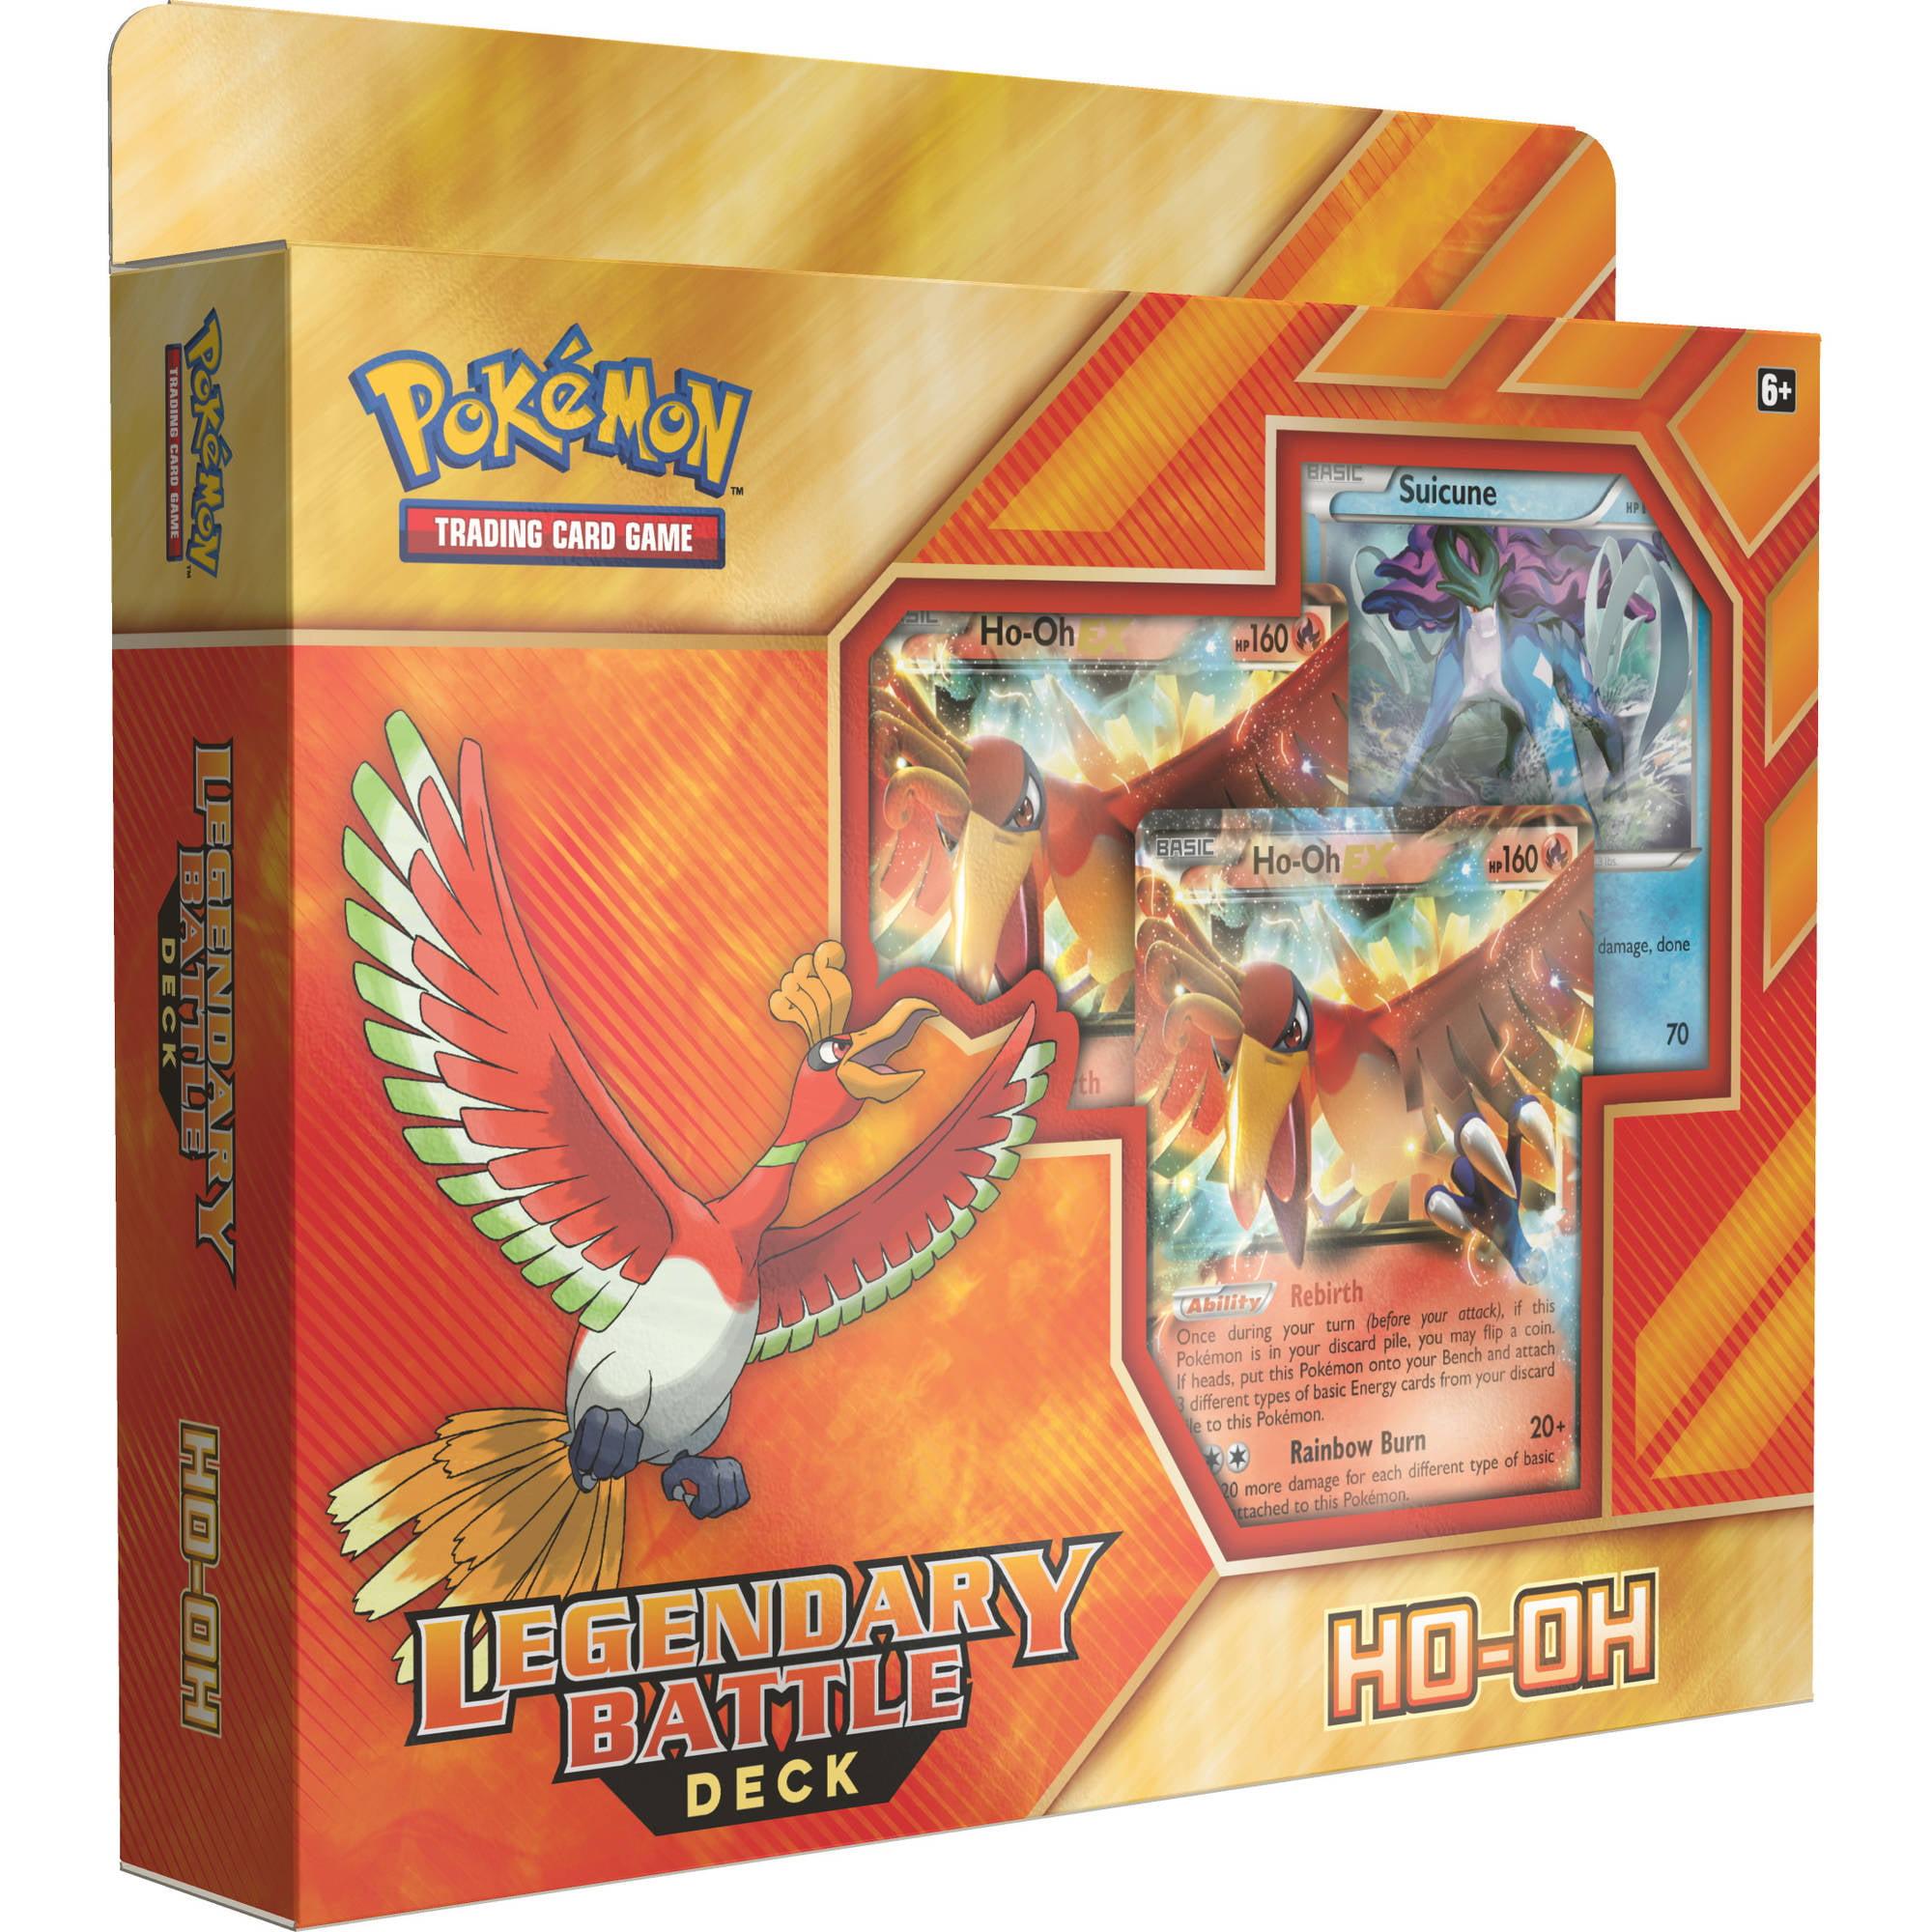 Pokemon TCG LEGENDARY BATTLE Deck LUGIA